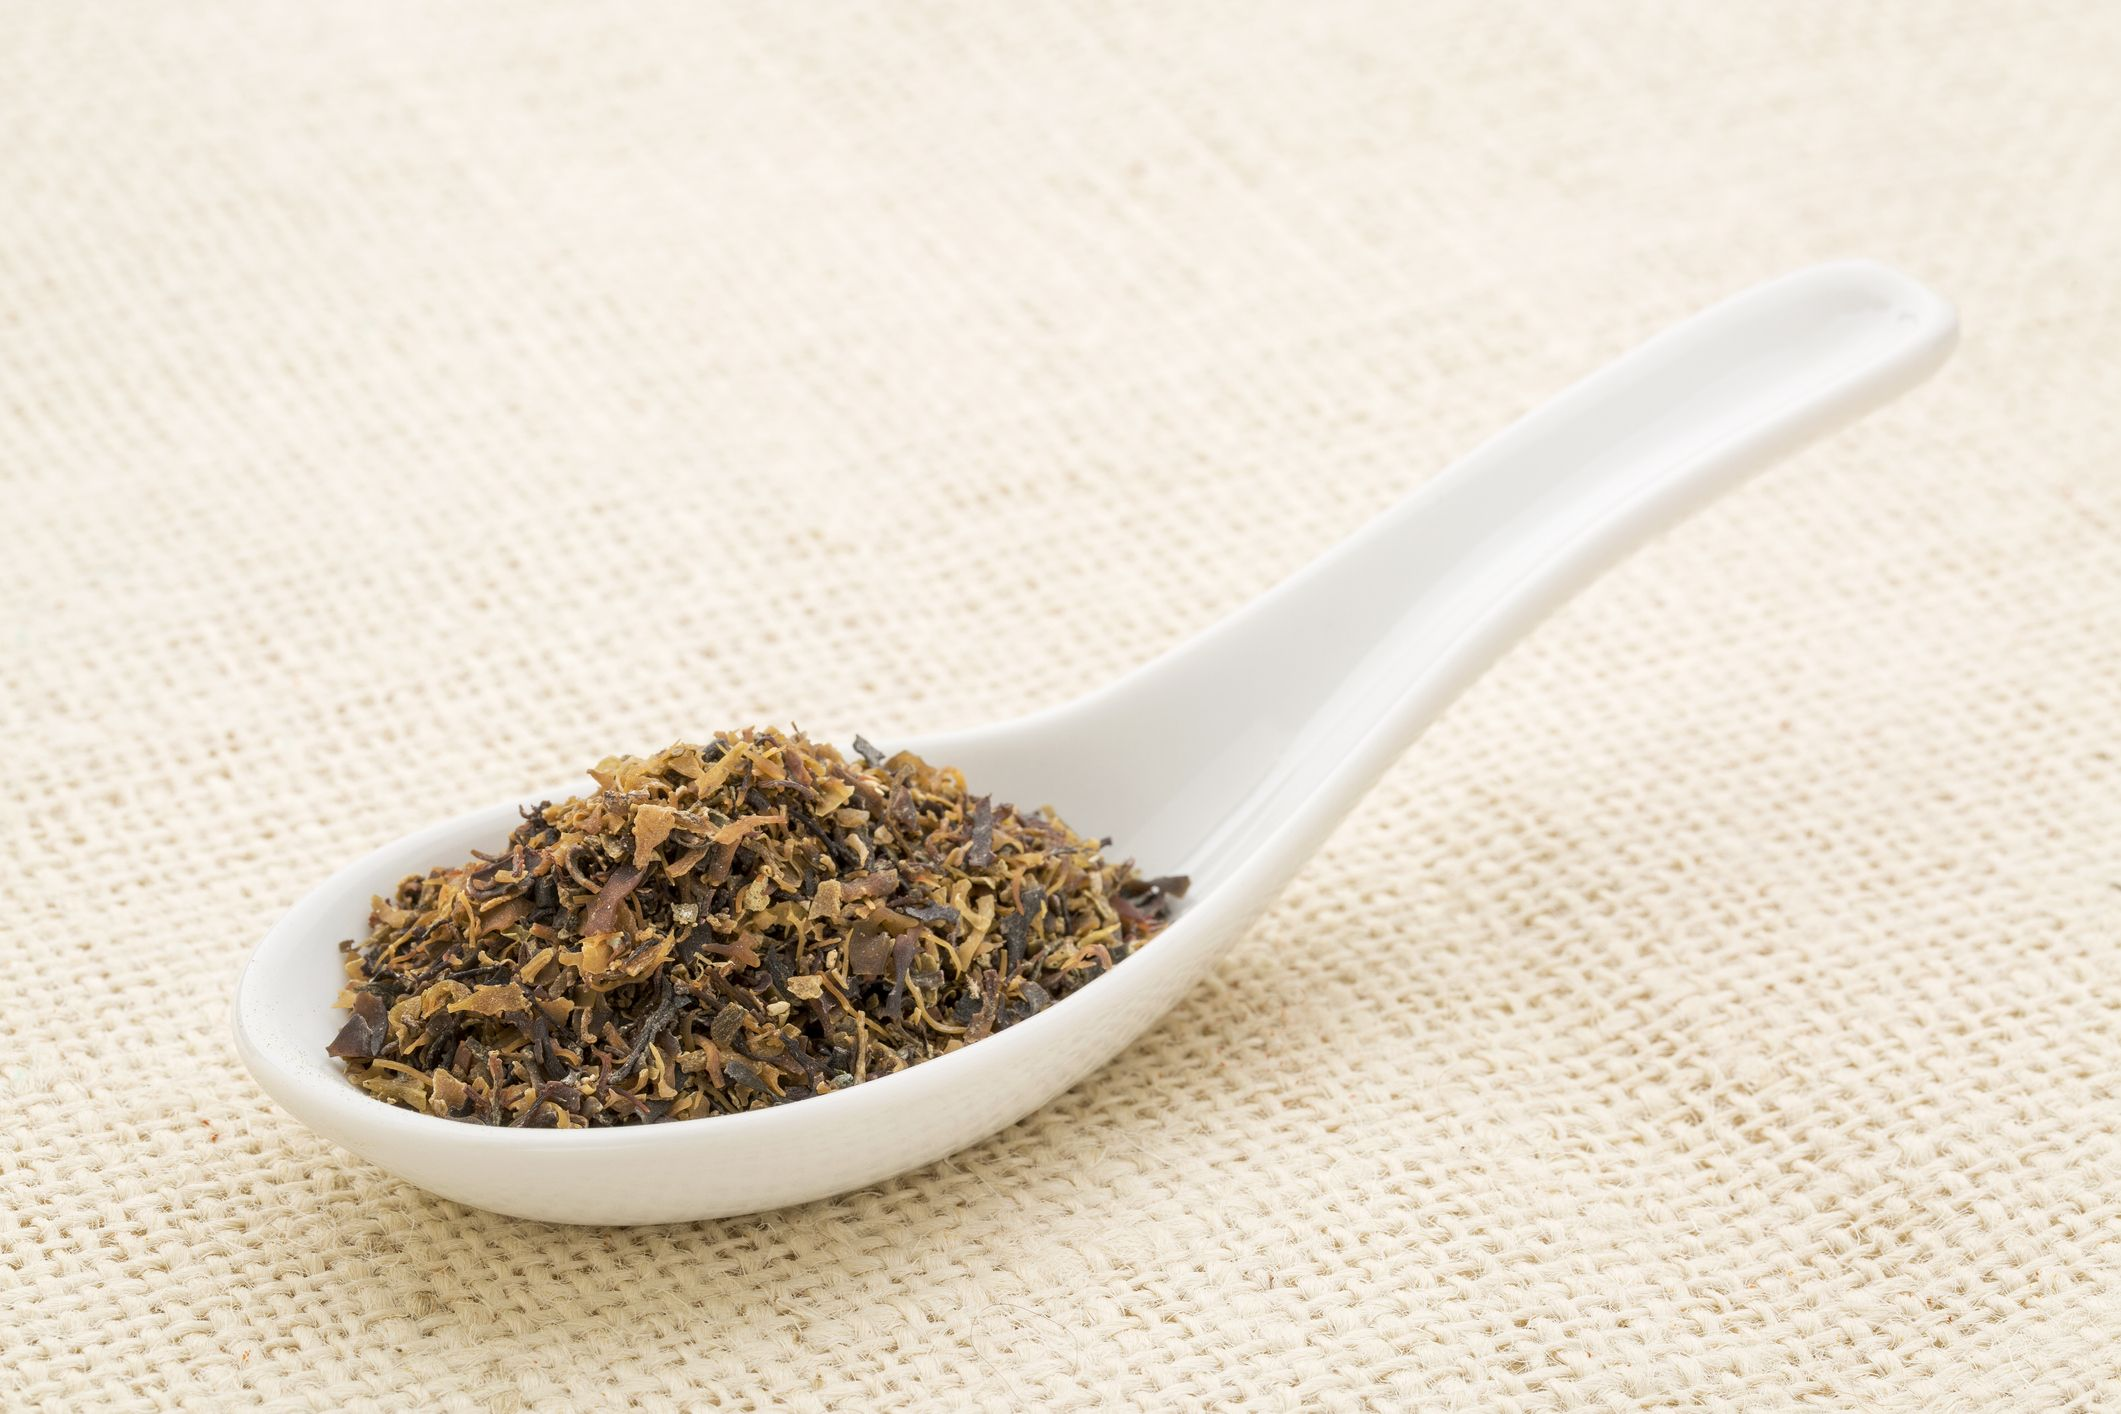 Health Benefits Of Sea Moss Is Irish Moss Good For You